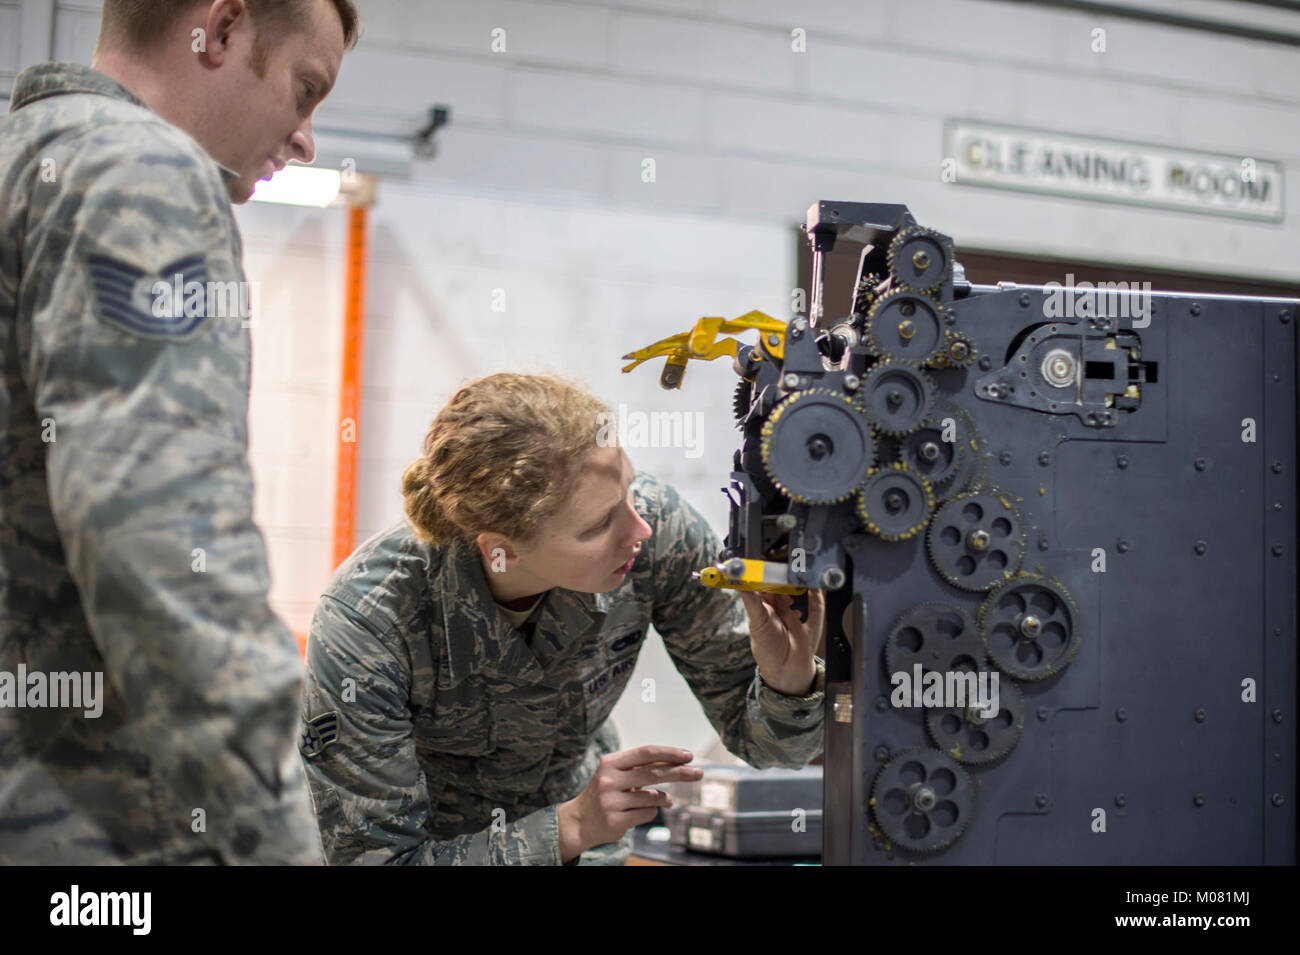 air force aircraft armament systems